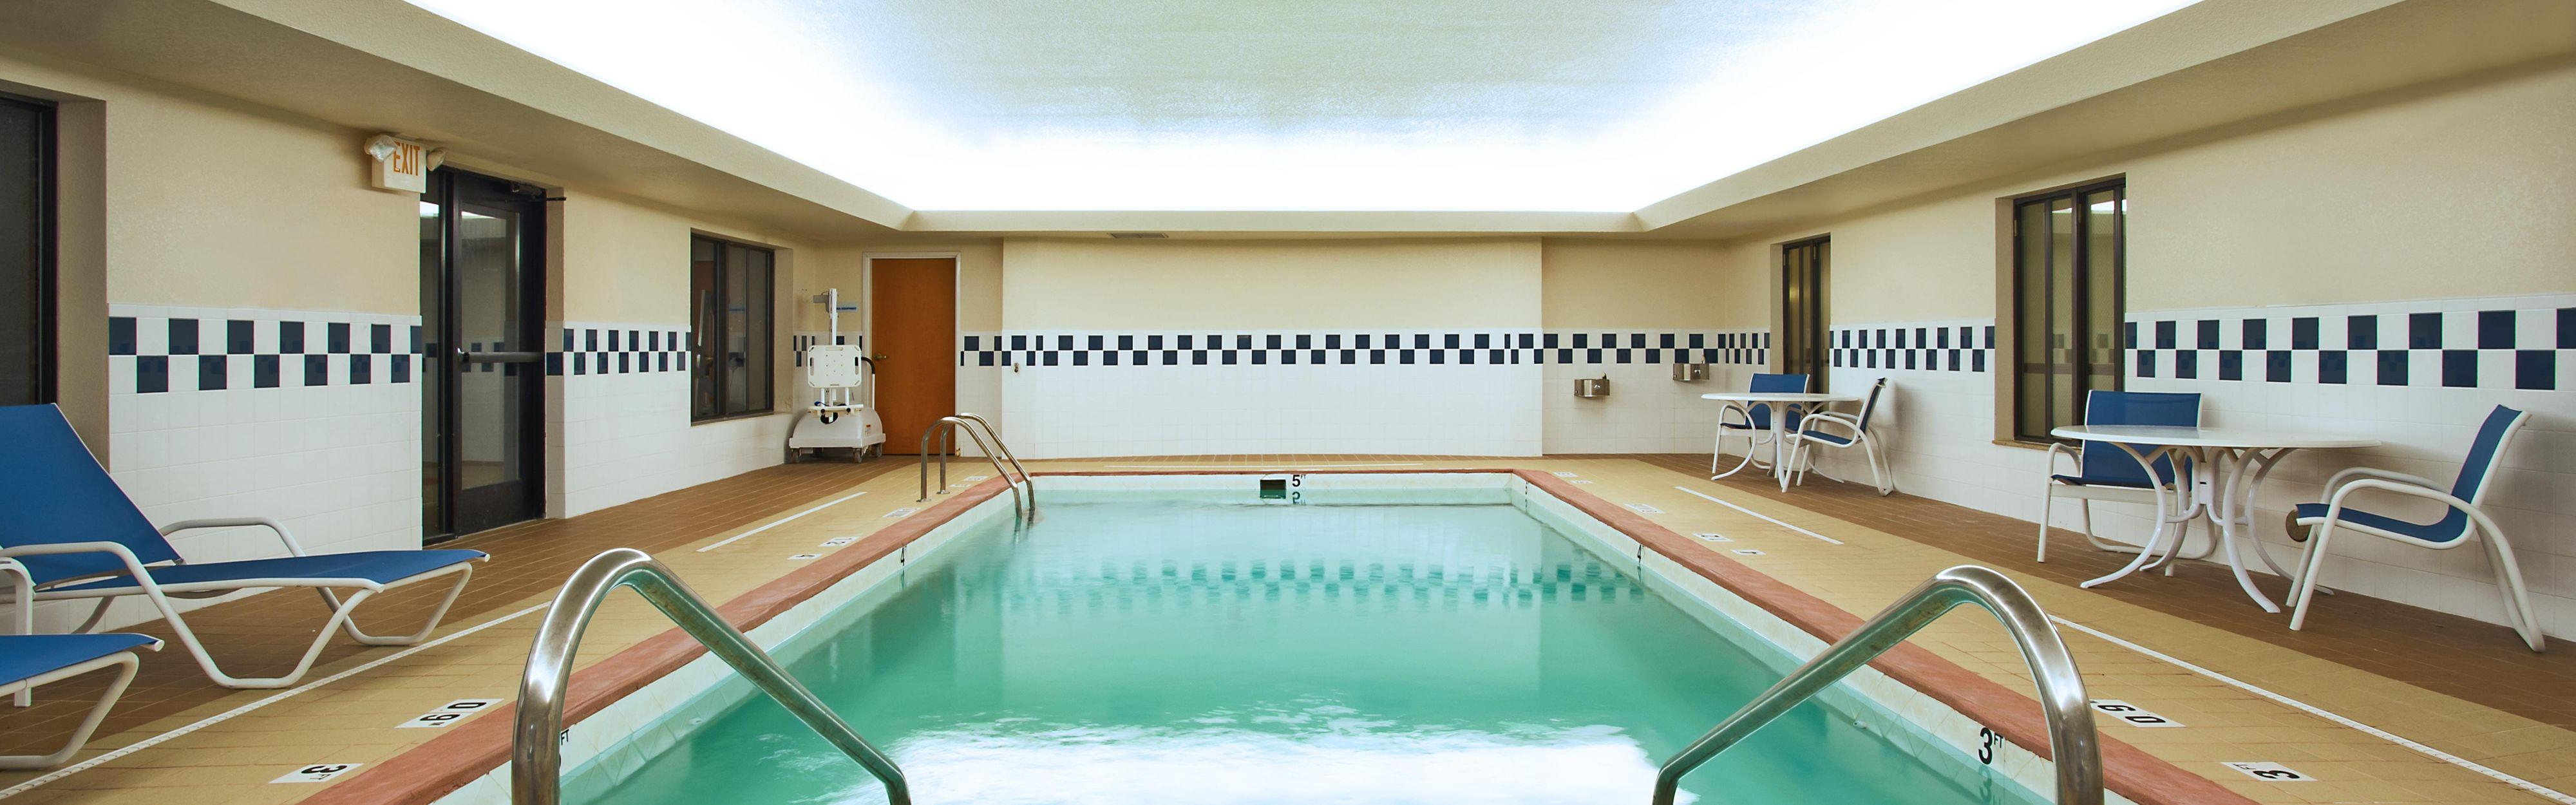 Holiday Inn Express & Suites East Lansing image 2